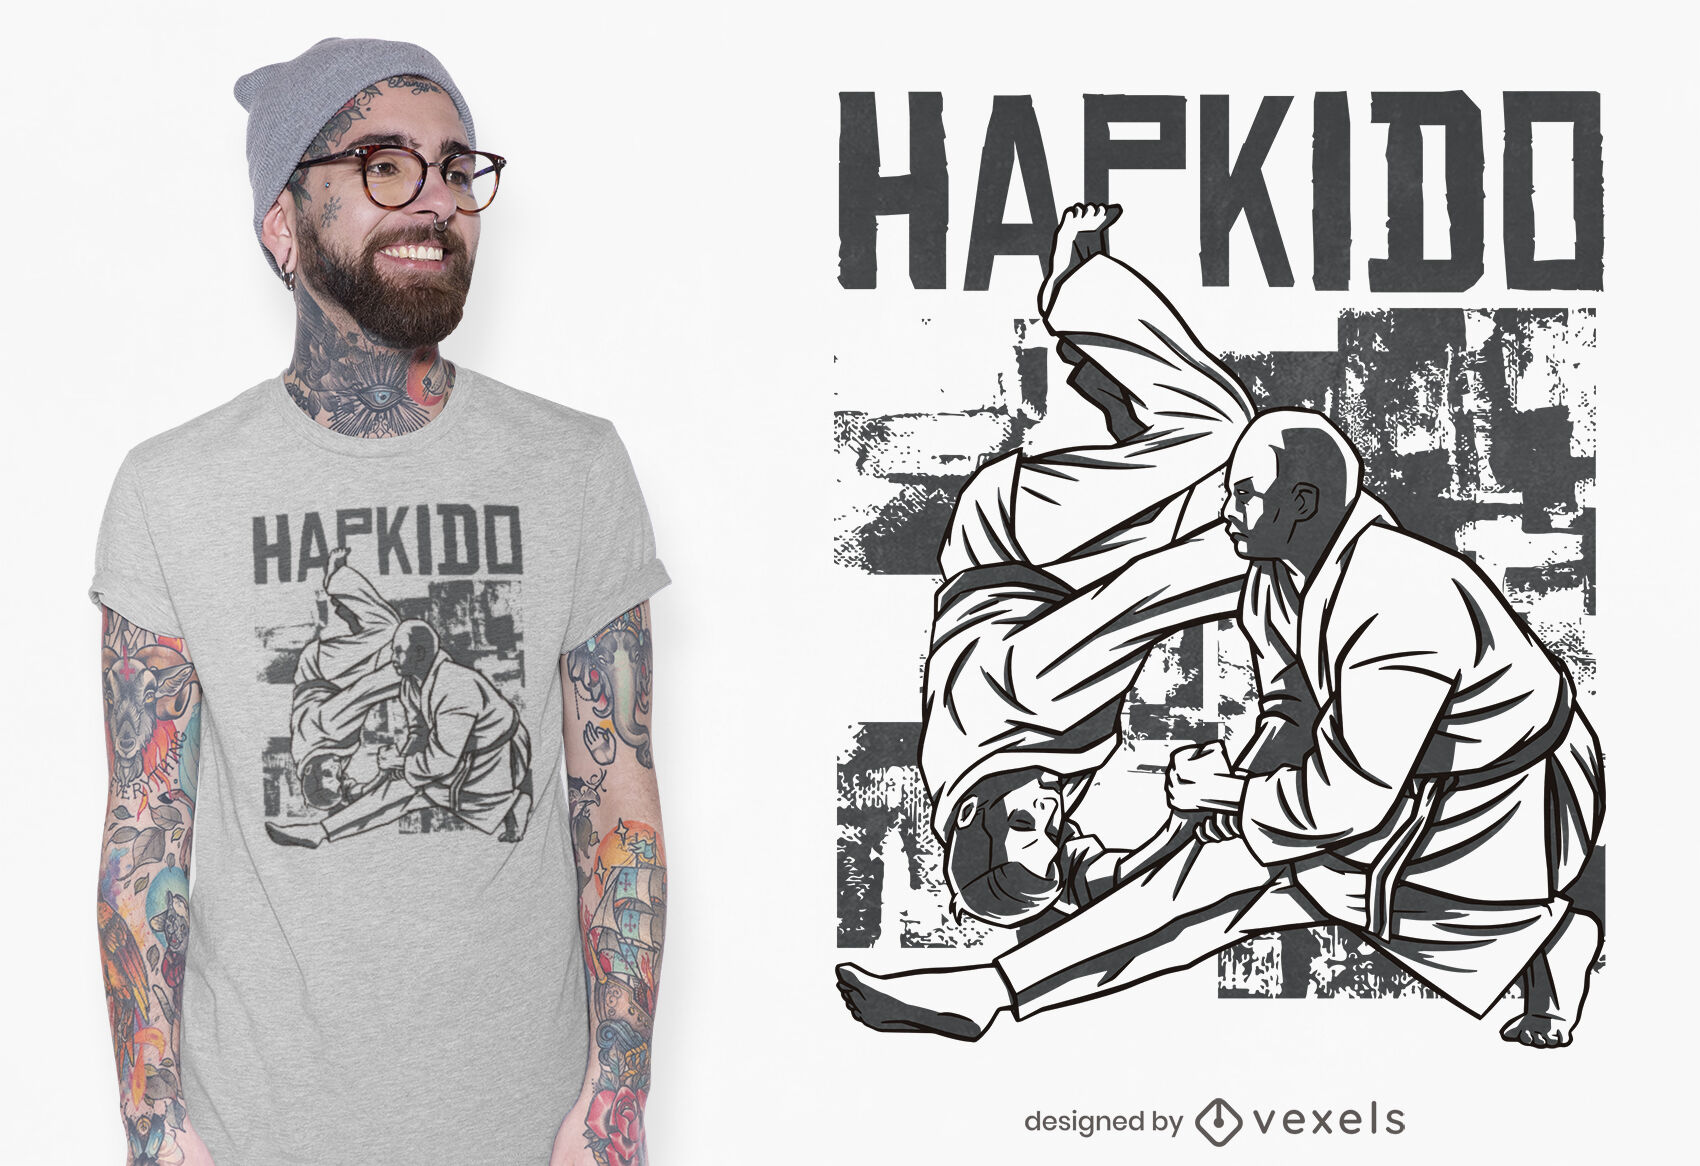 Hapkido martian arts t-shirt design